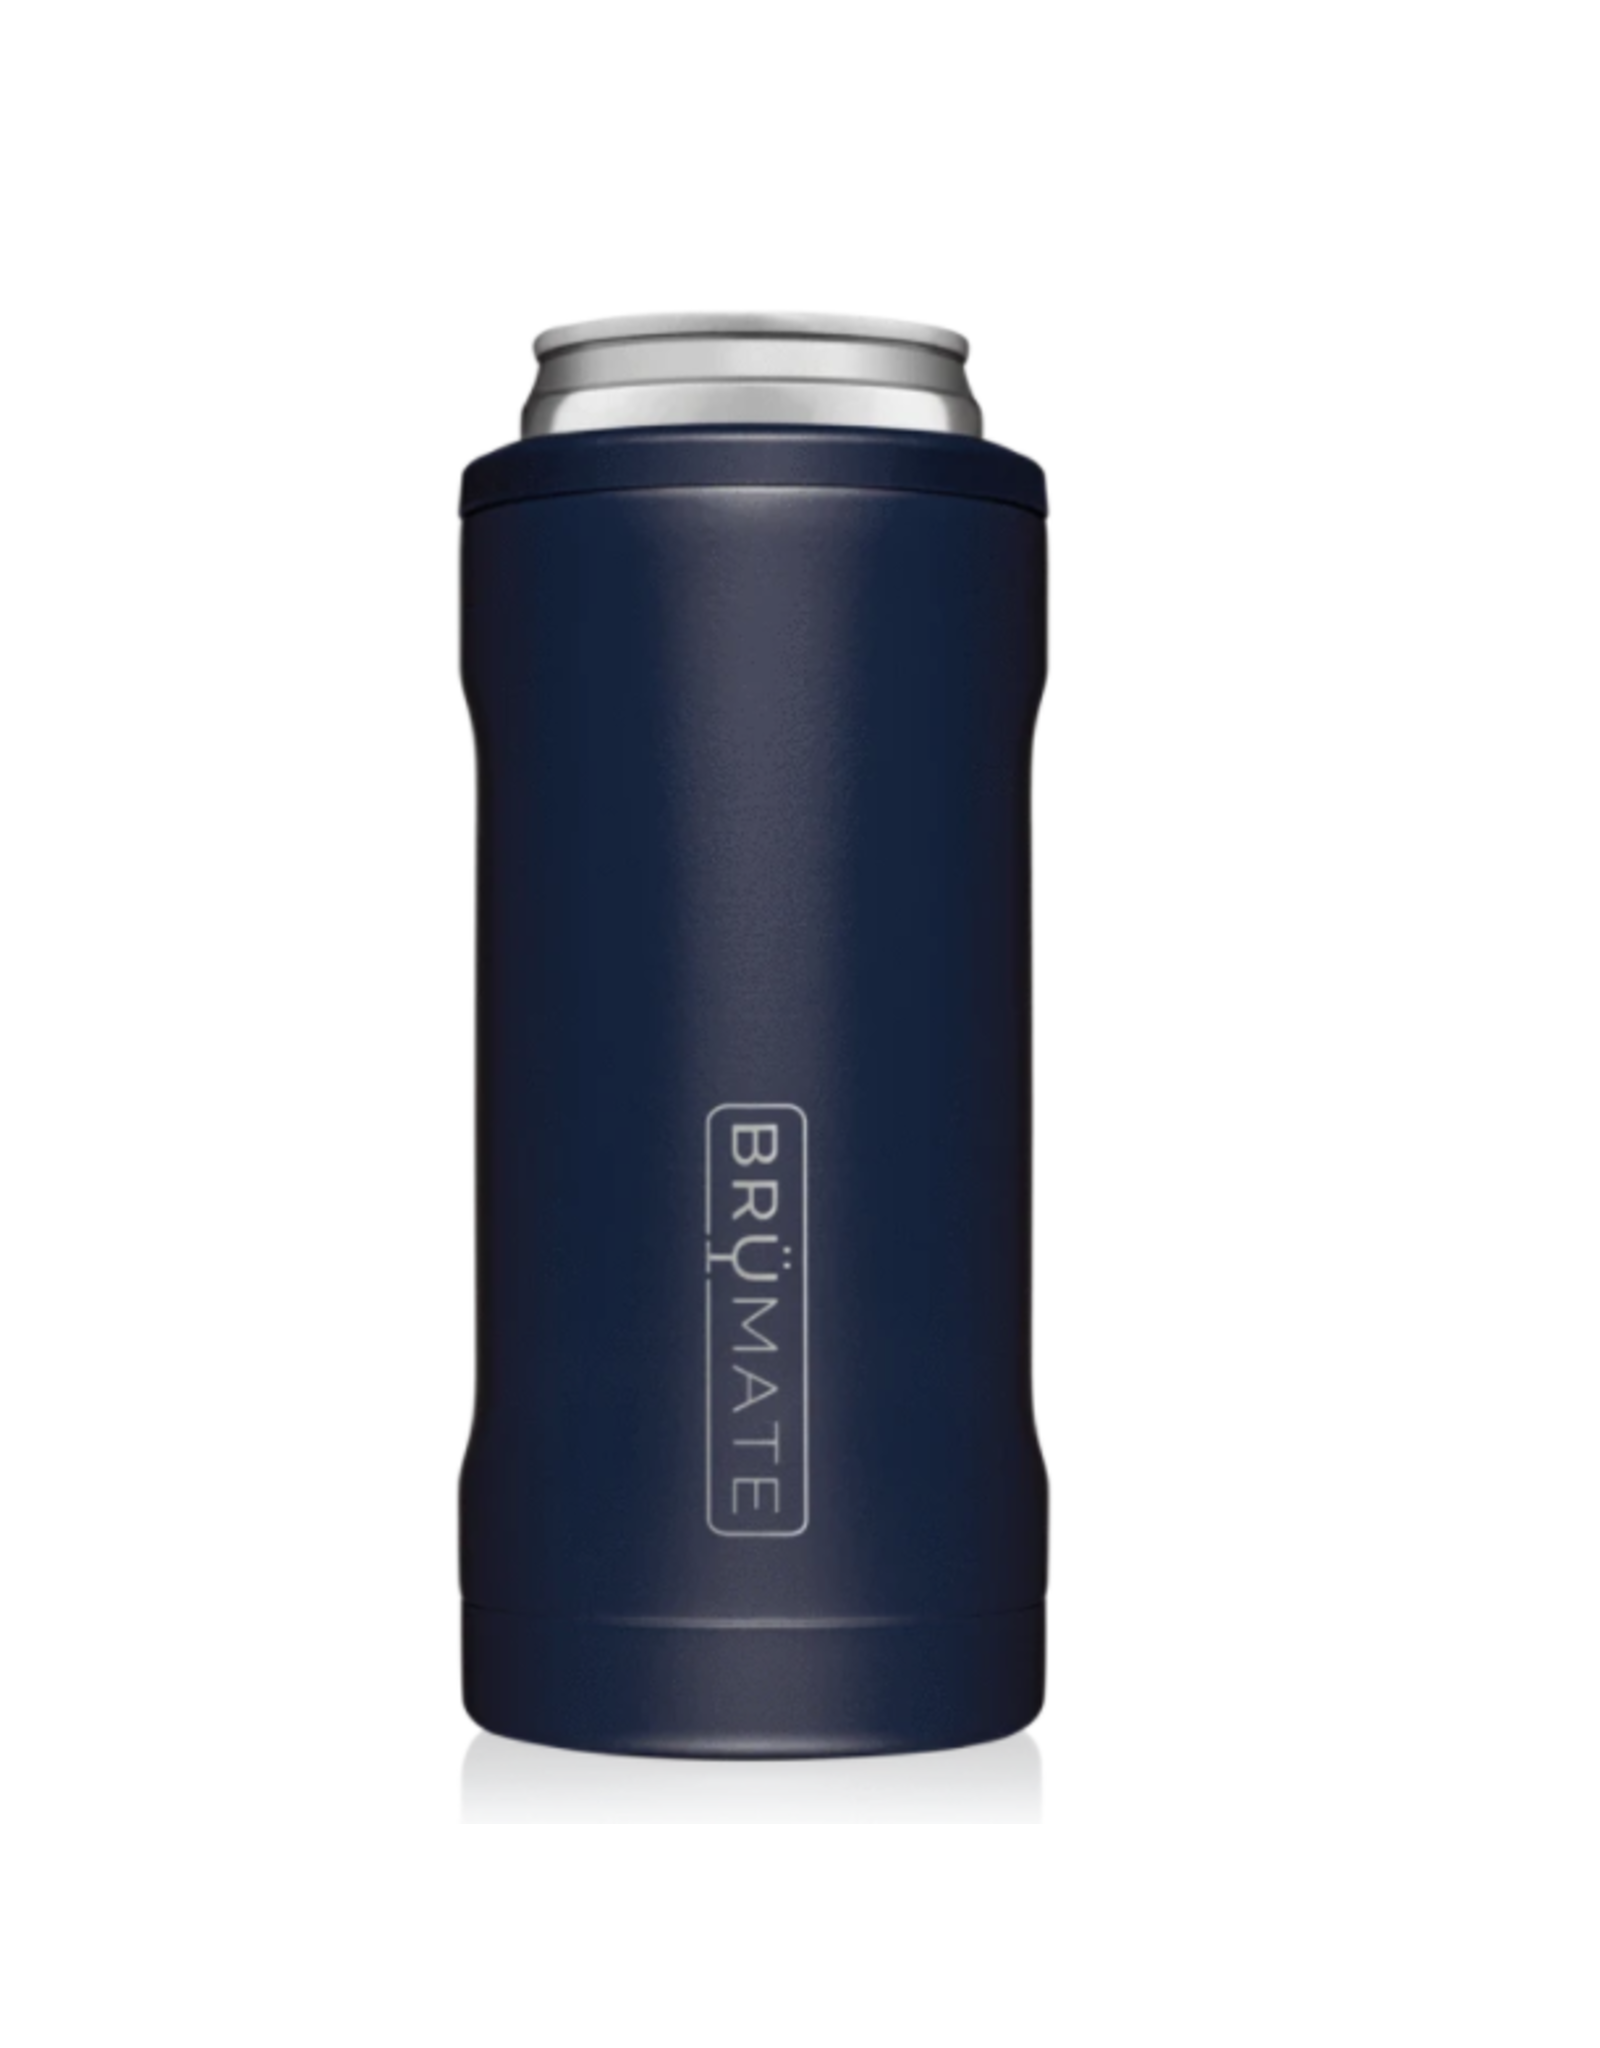 Hopsulator Slim Insulated Can-Cooler, matte navy